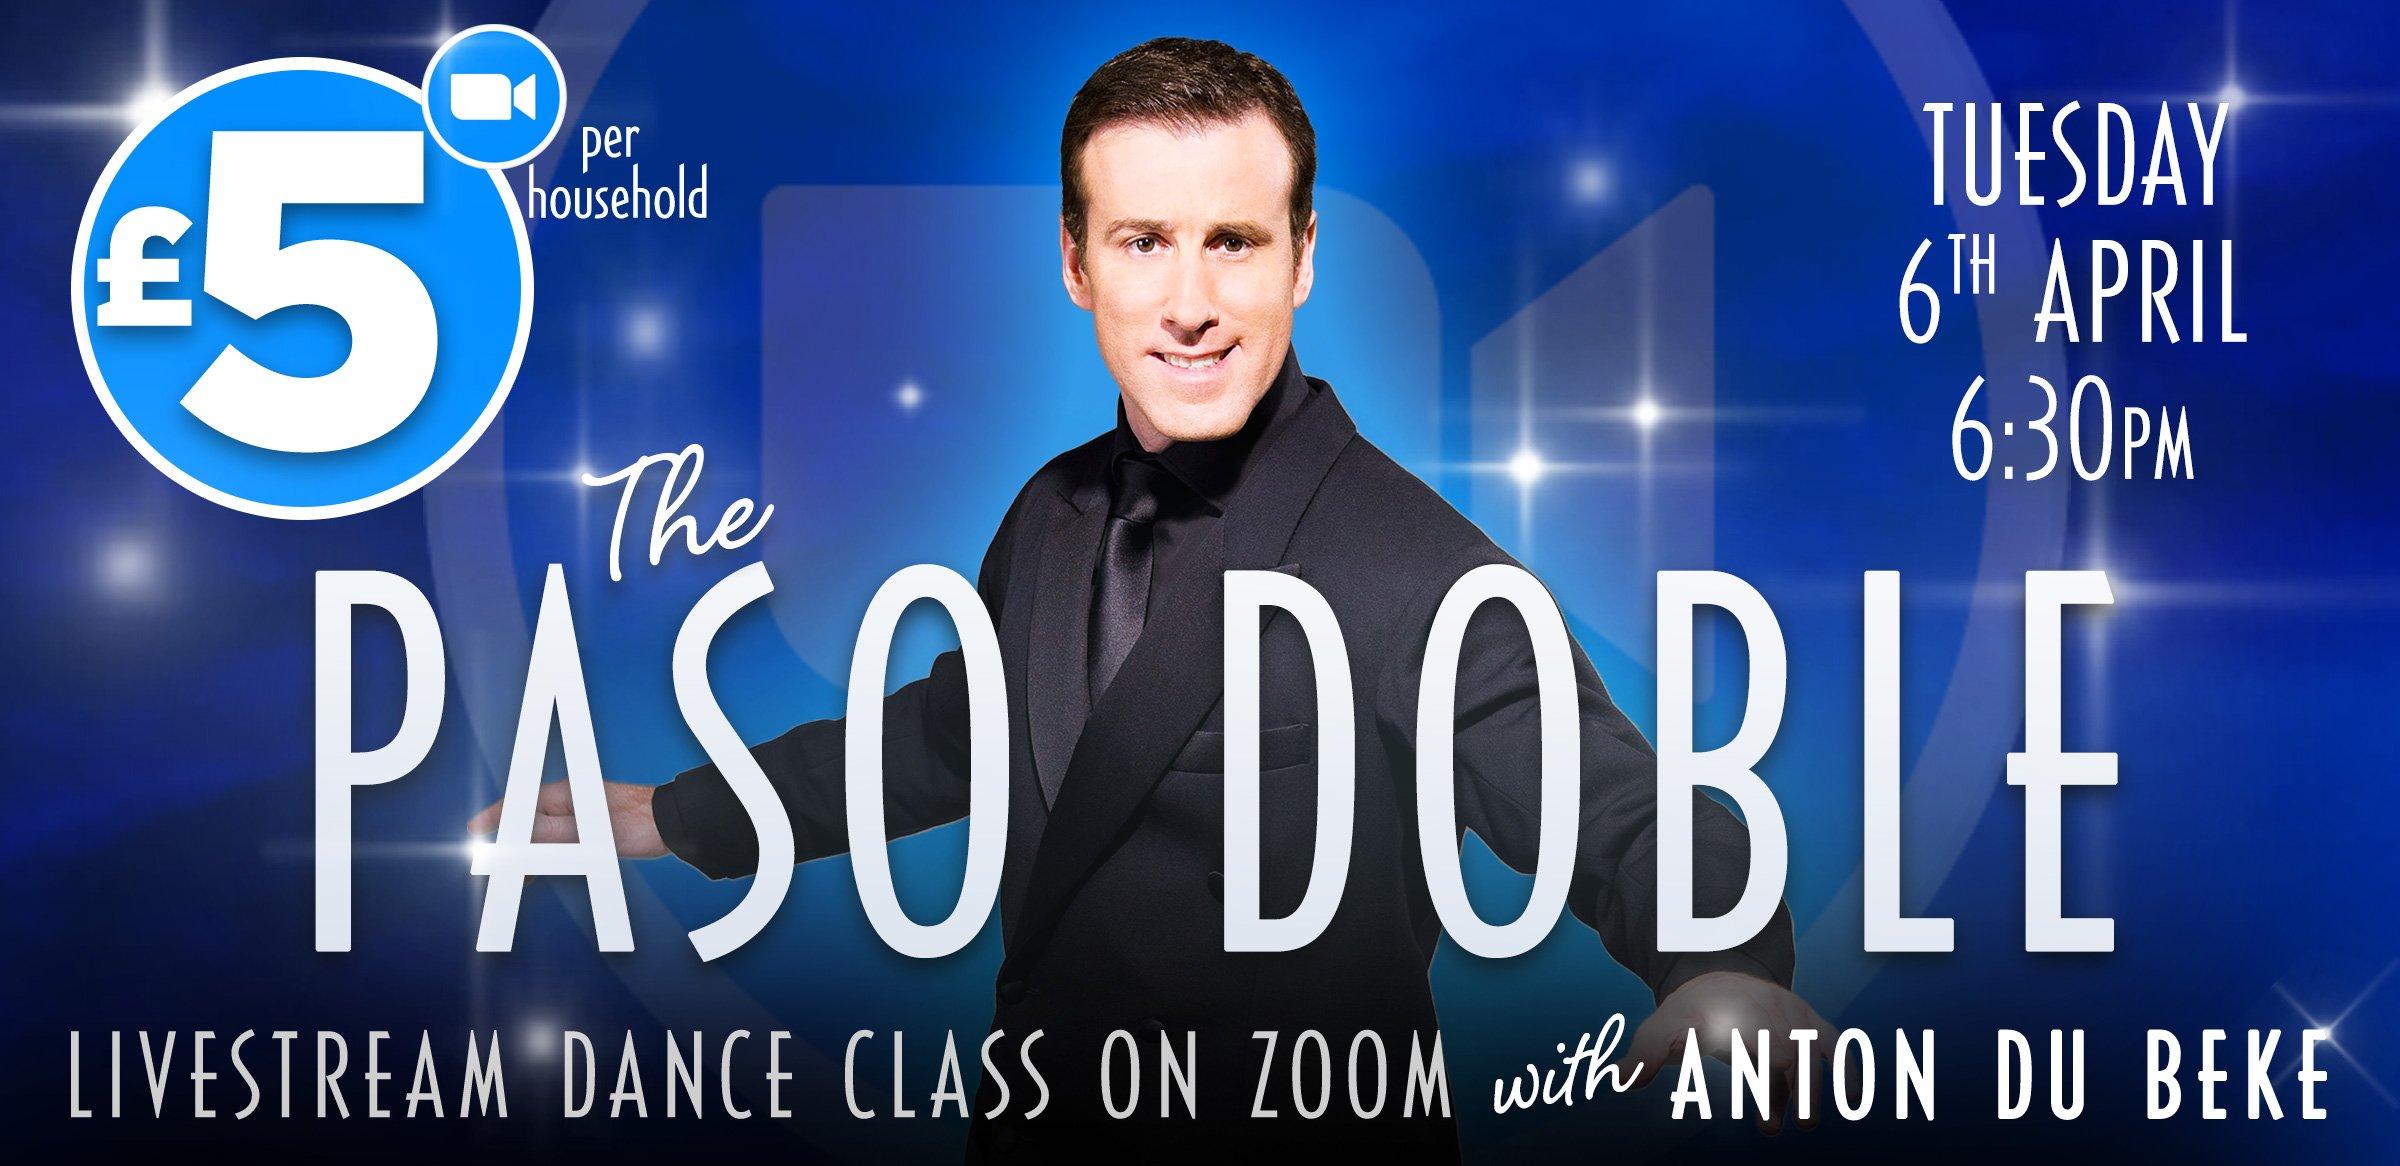 Paso Doble class with Anton Du Beke on Zoom